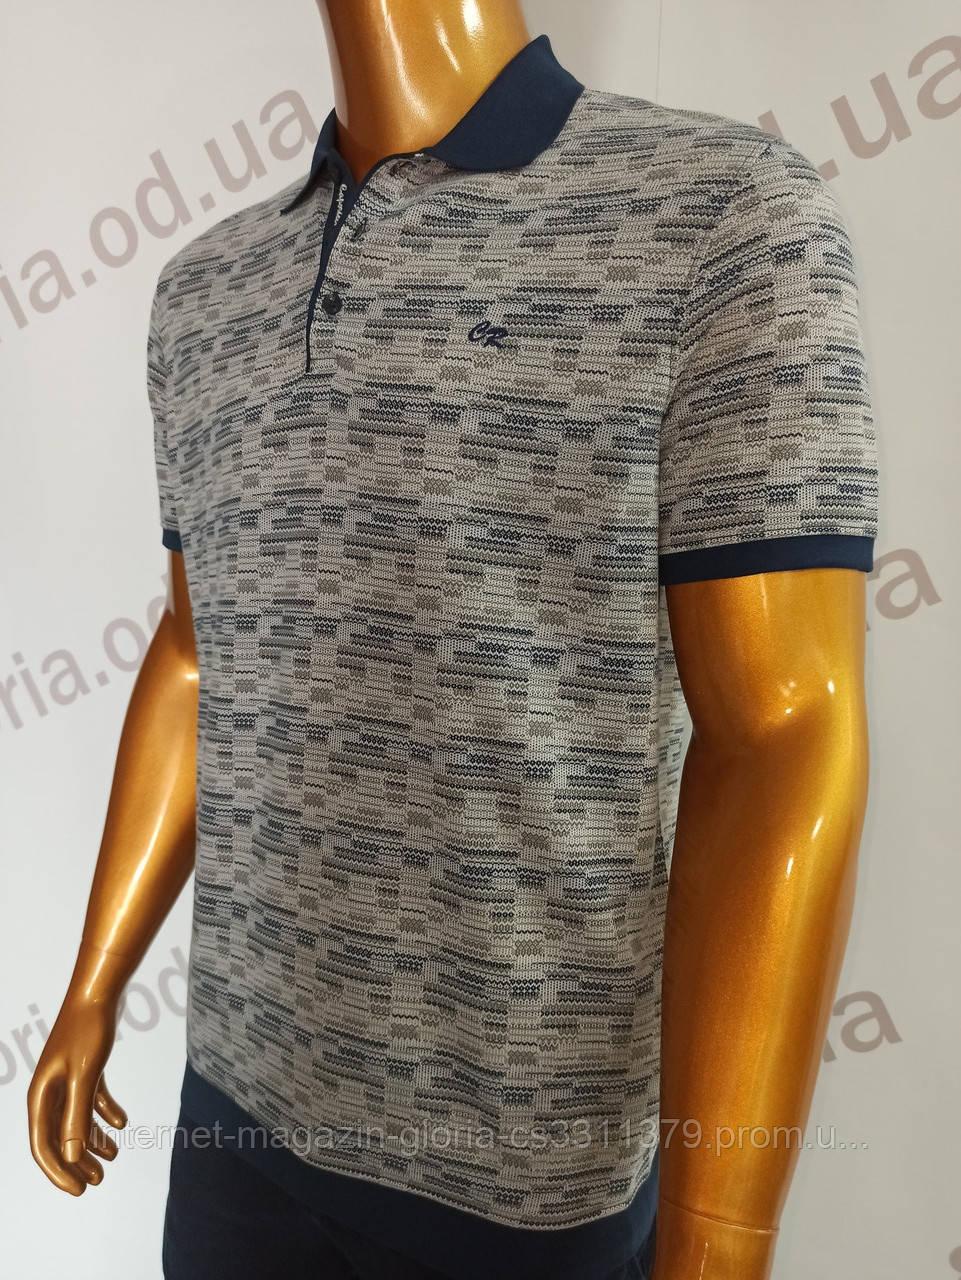 Мужская футболка поло Caporicco. PSL-8831. Размеры:  Батал 2XL(2),3XL,4XL.